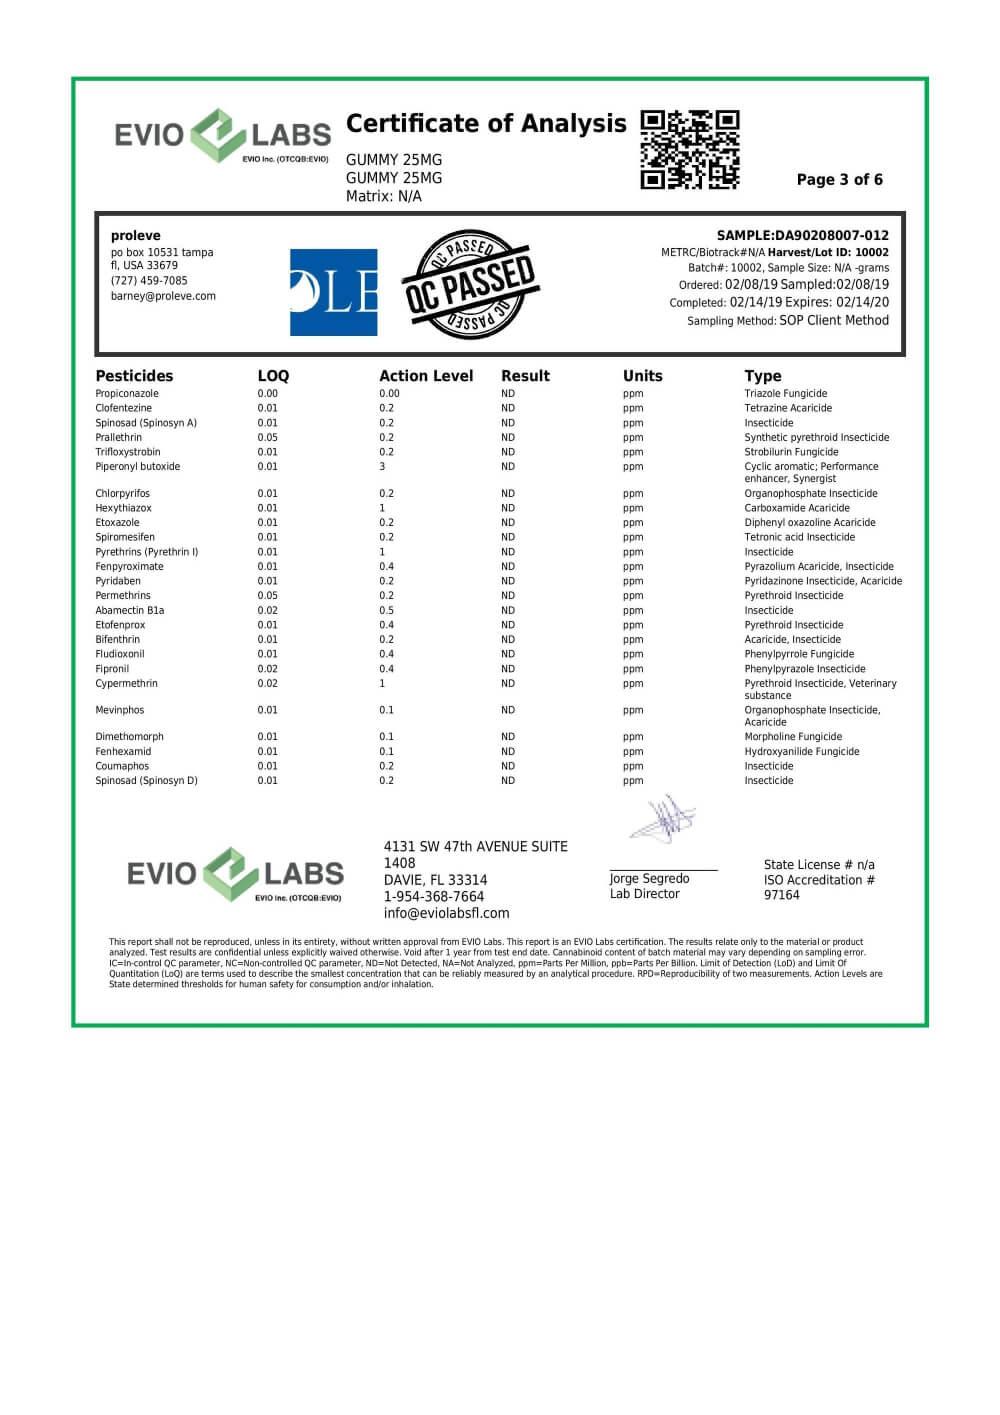 Proleve CBD Edible Gummy Slices 25mg Lab Report